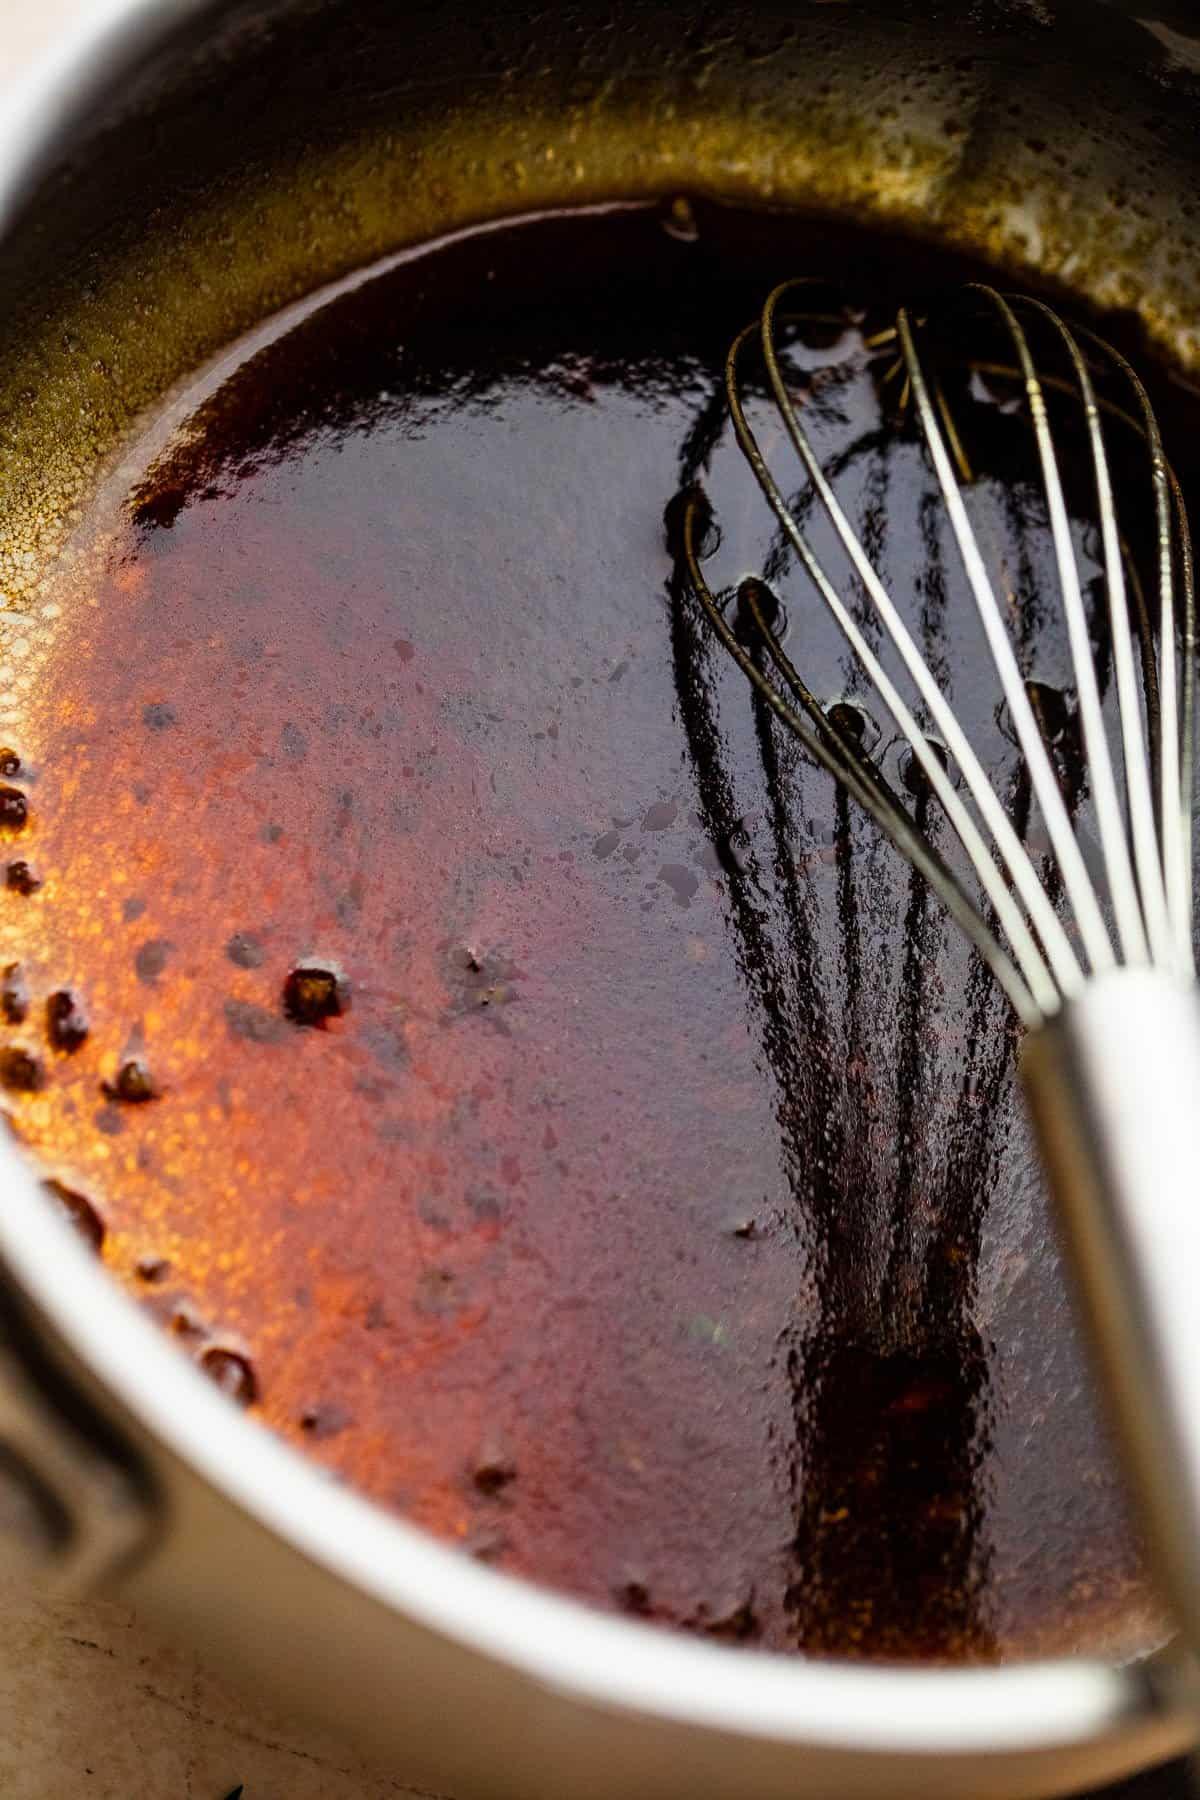 whisking sauce in a saucepan